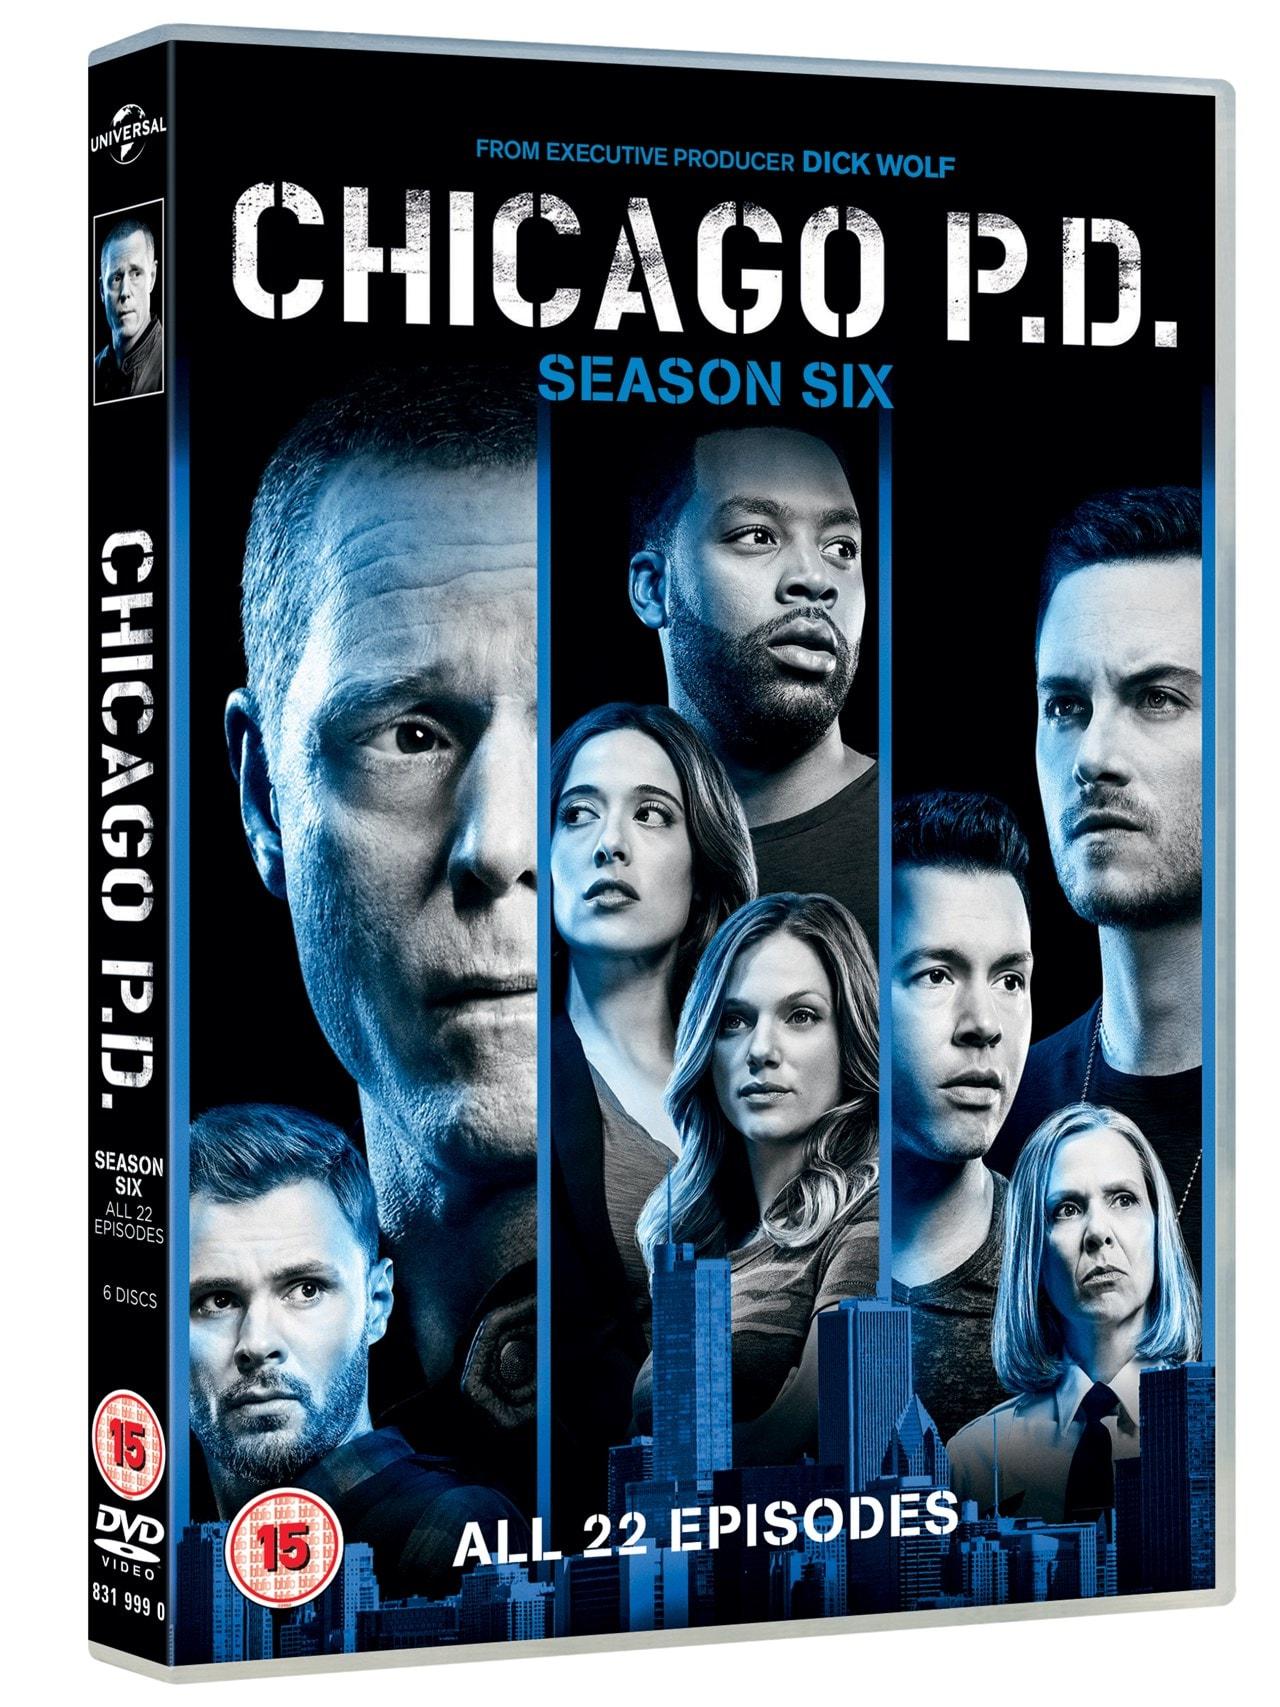 Chicago P.D.: Season Six - 2